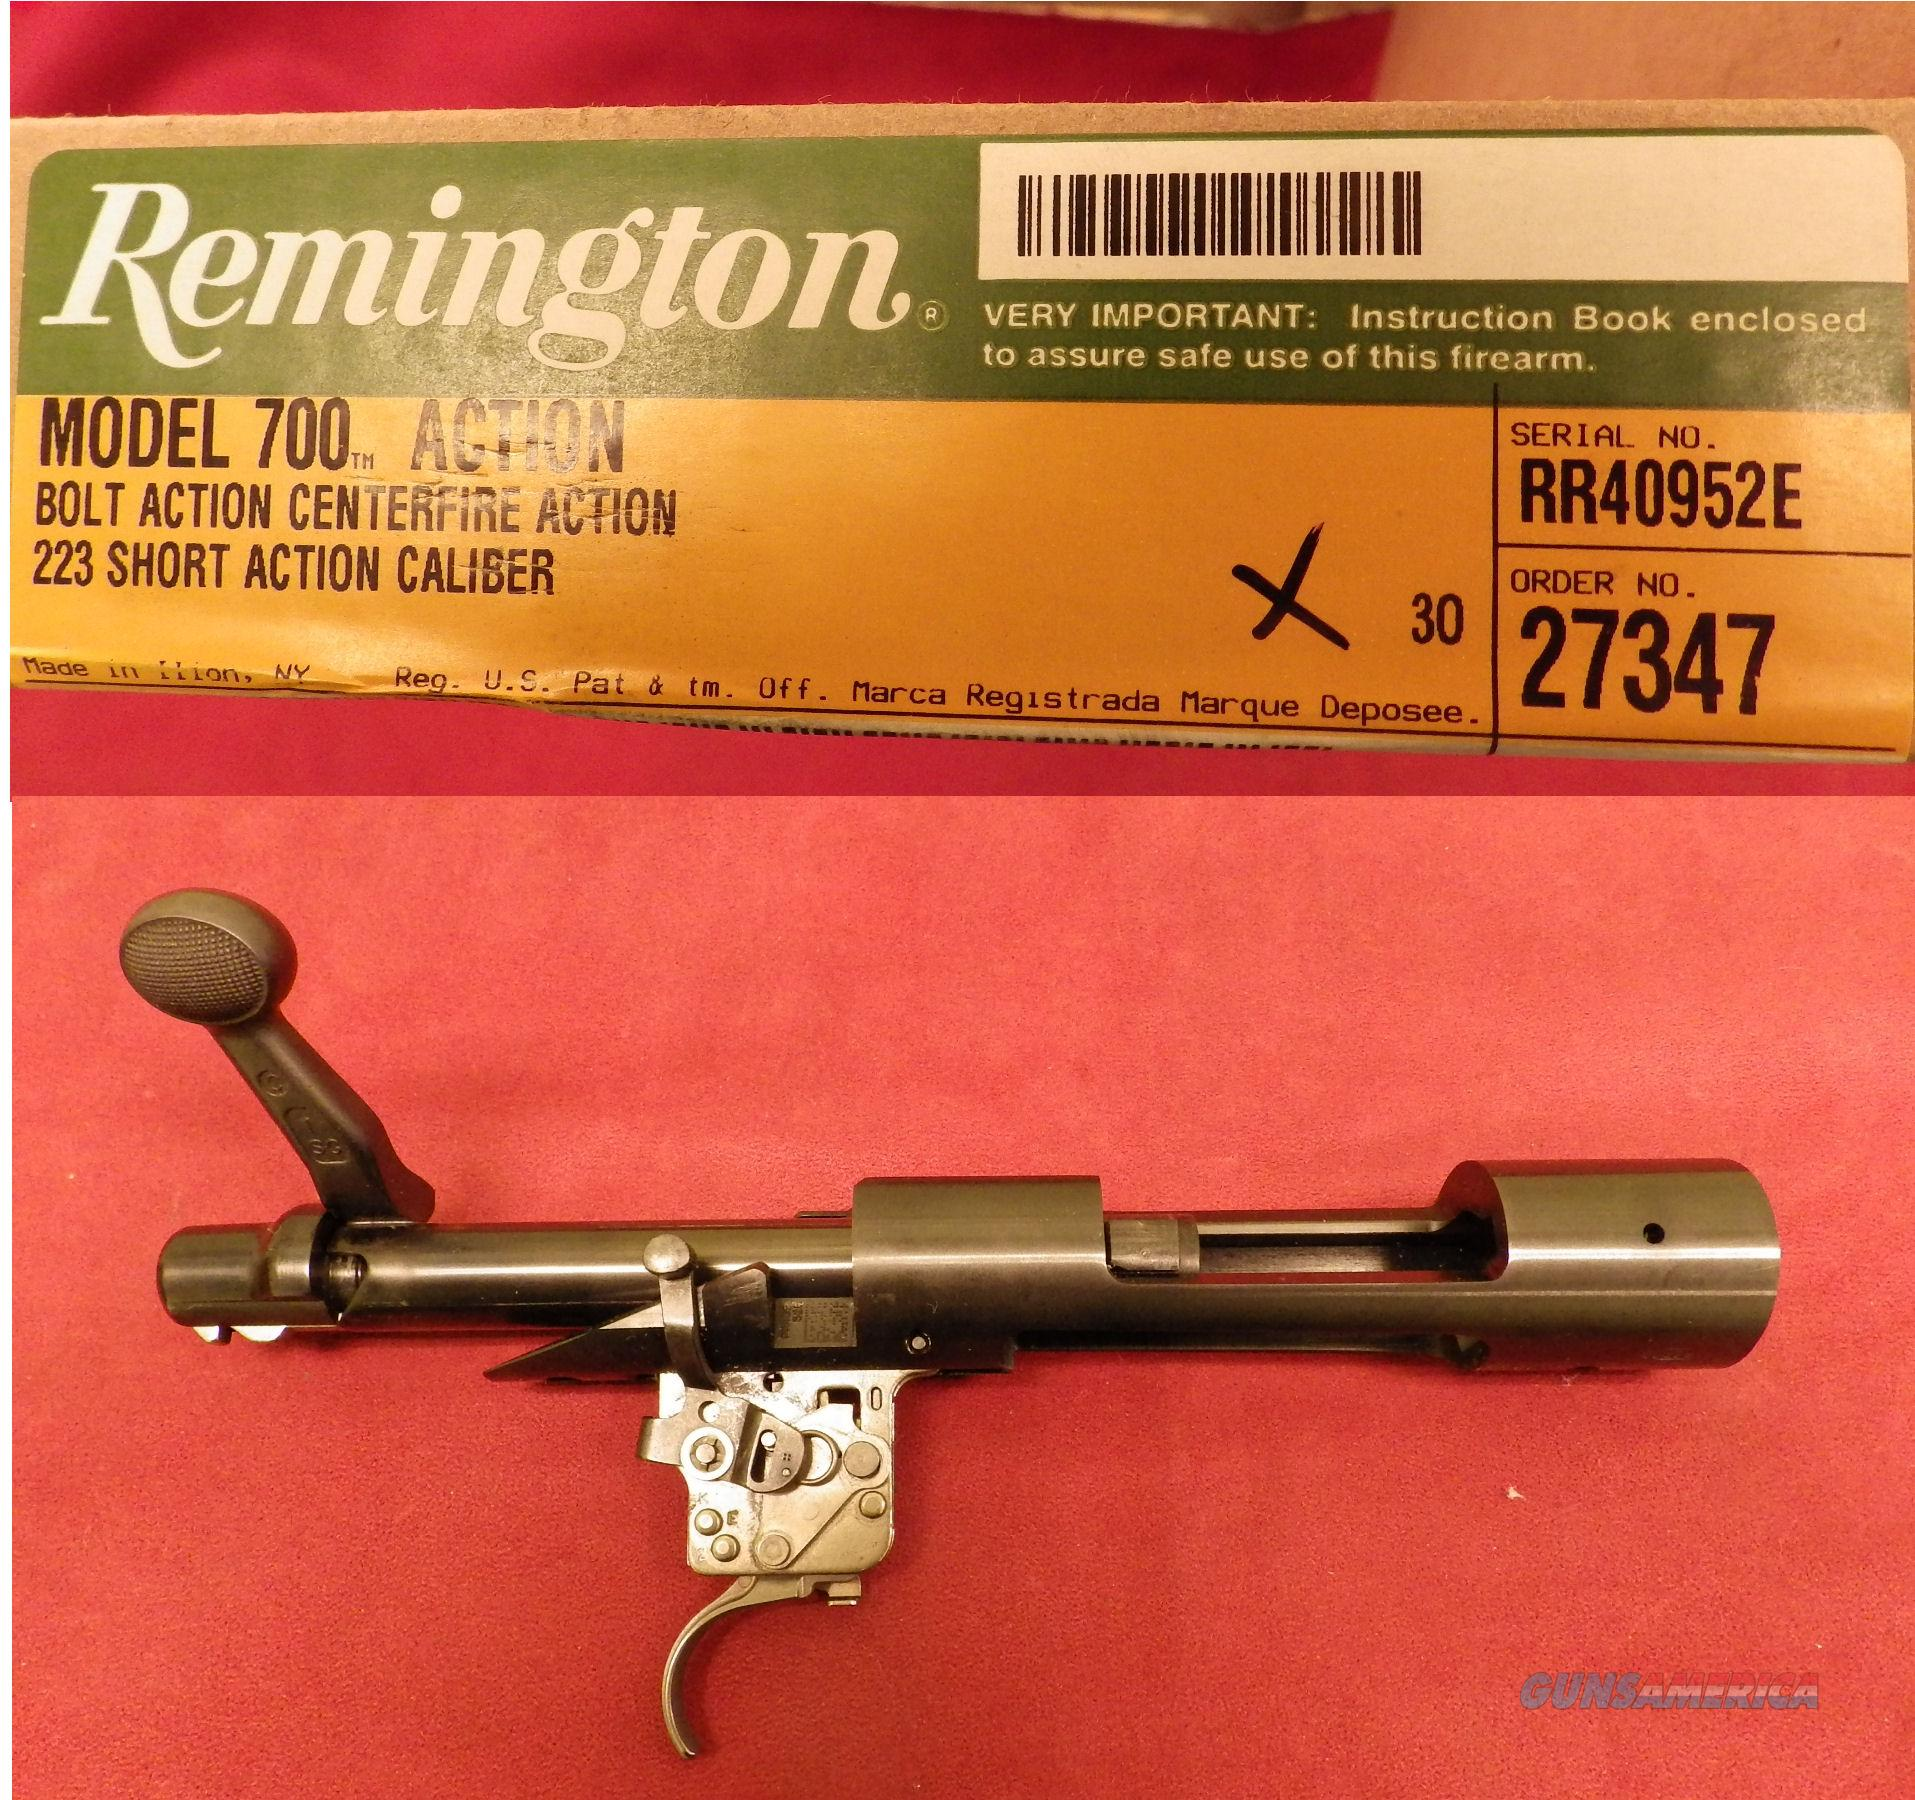 Remington 700 RH Short Action Only, .223 Bolt Face, NIB  Guns > Rifles > Remington Rifles - Modern > Model 700 > Sporting